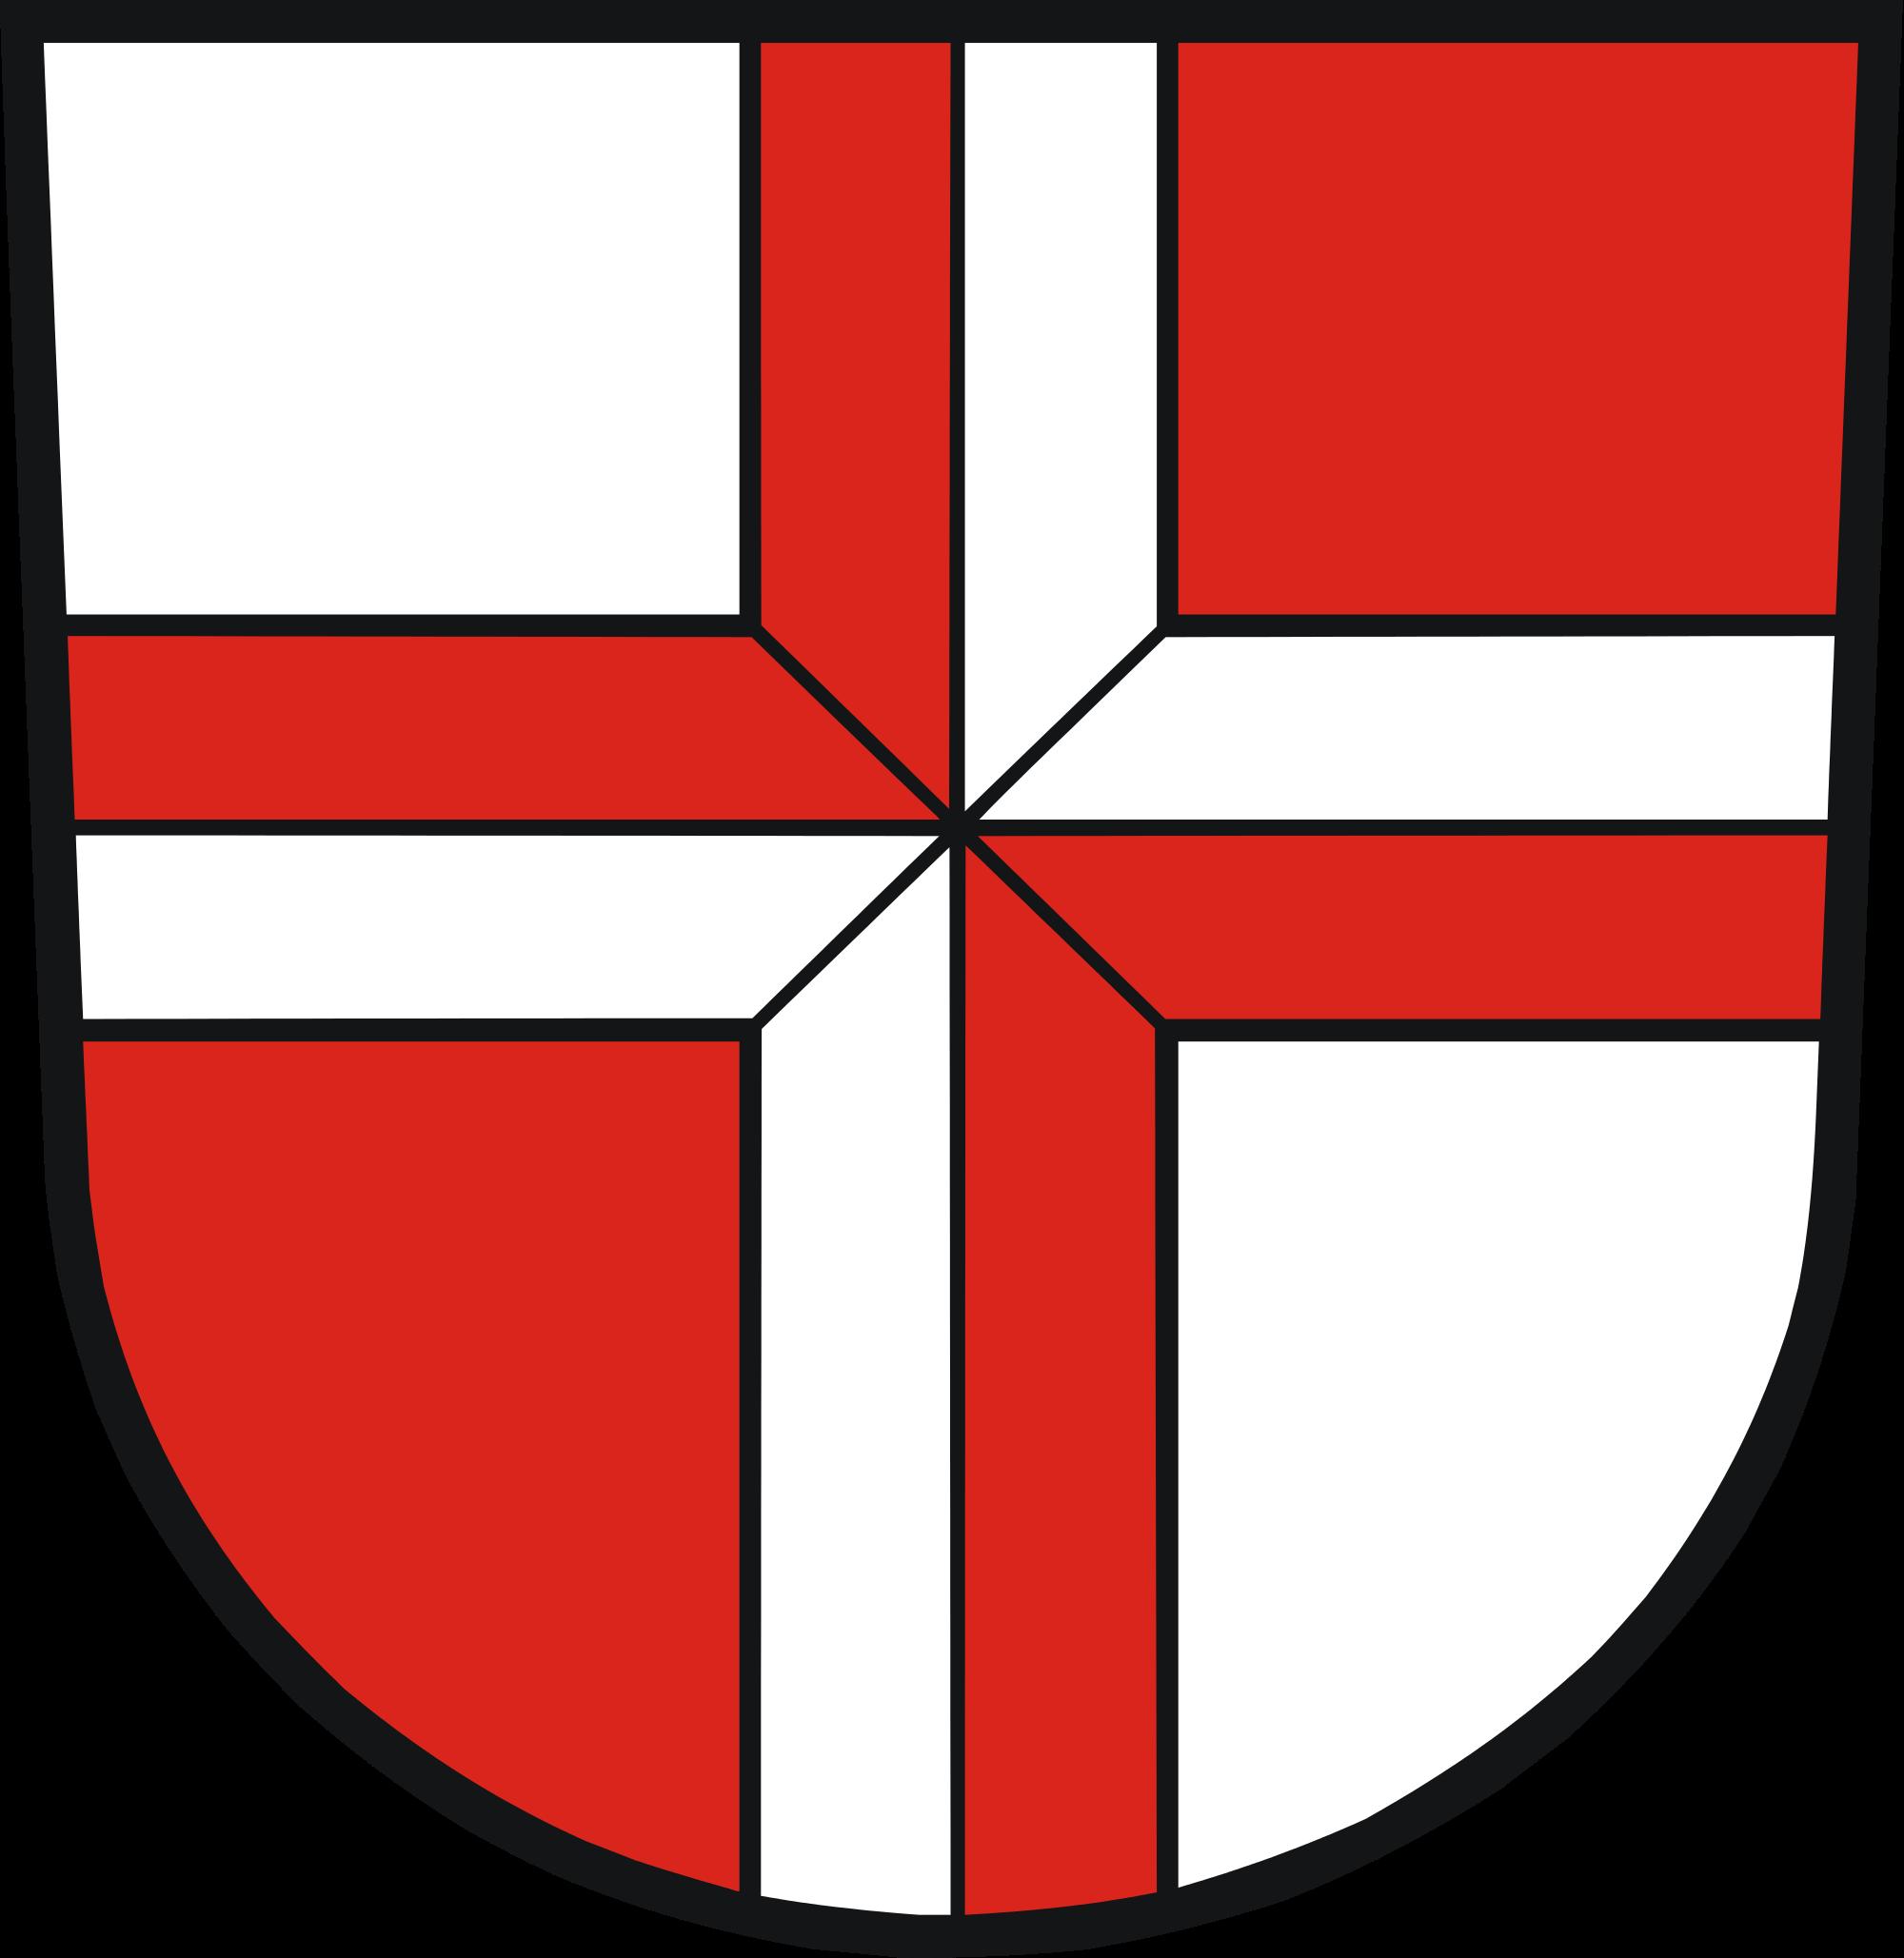 File:Stetten am kalten Markt Wappen.svg.